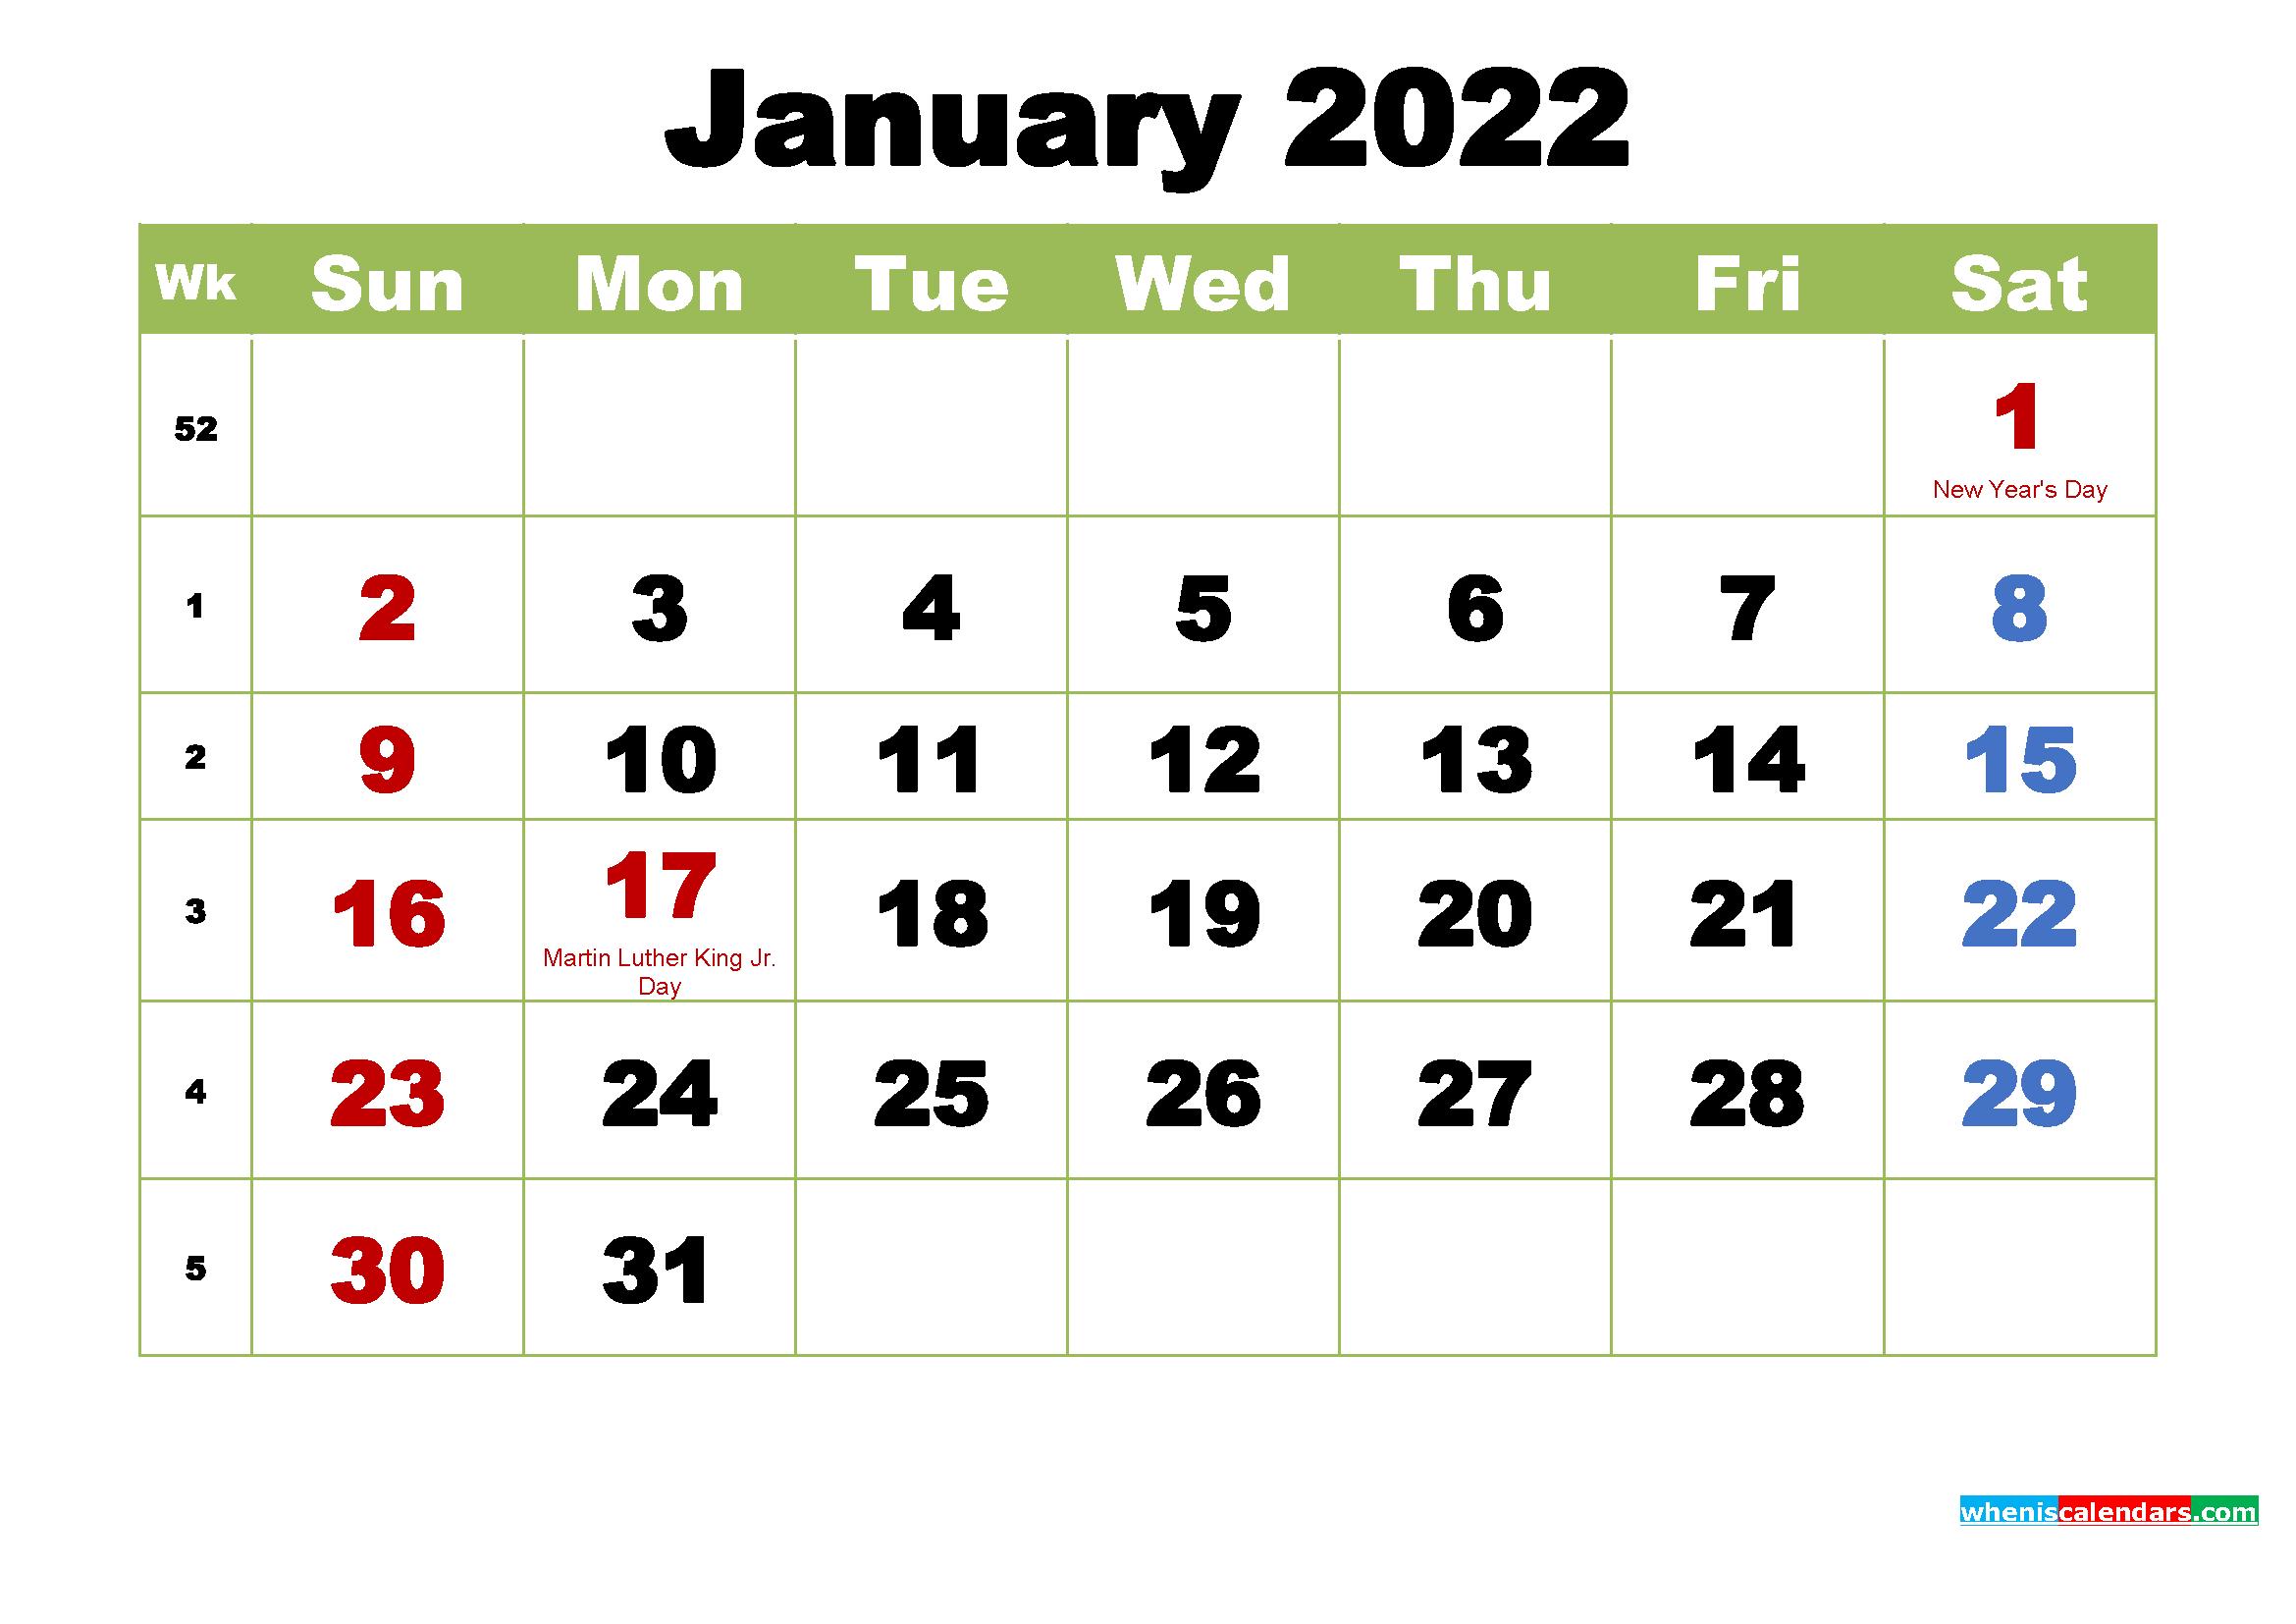 Free January 2022 Printable Calendar With Holidays   Free throughout Free Printable Printable Pdf January 2022 Calendar